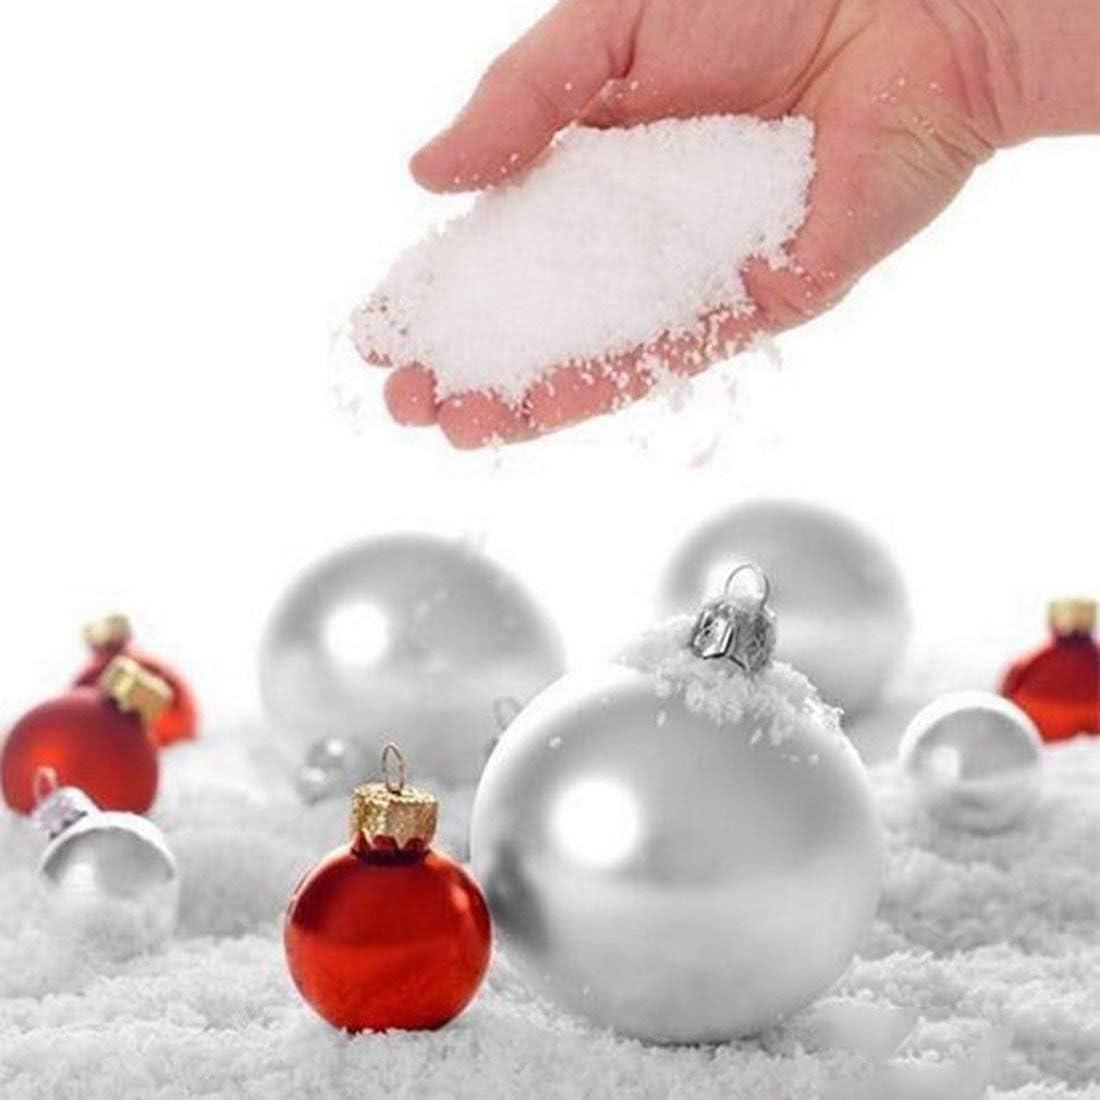 vbncvbfghfgh Fashion 10 Pcs Fake Magic Instant Artificial Snow Scene Play Frozen Wedding Christmas Outdoor Decoration Supplies